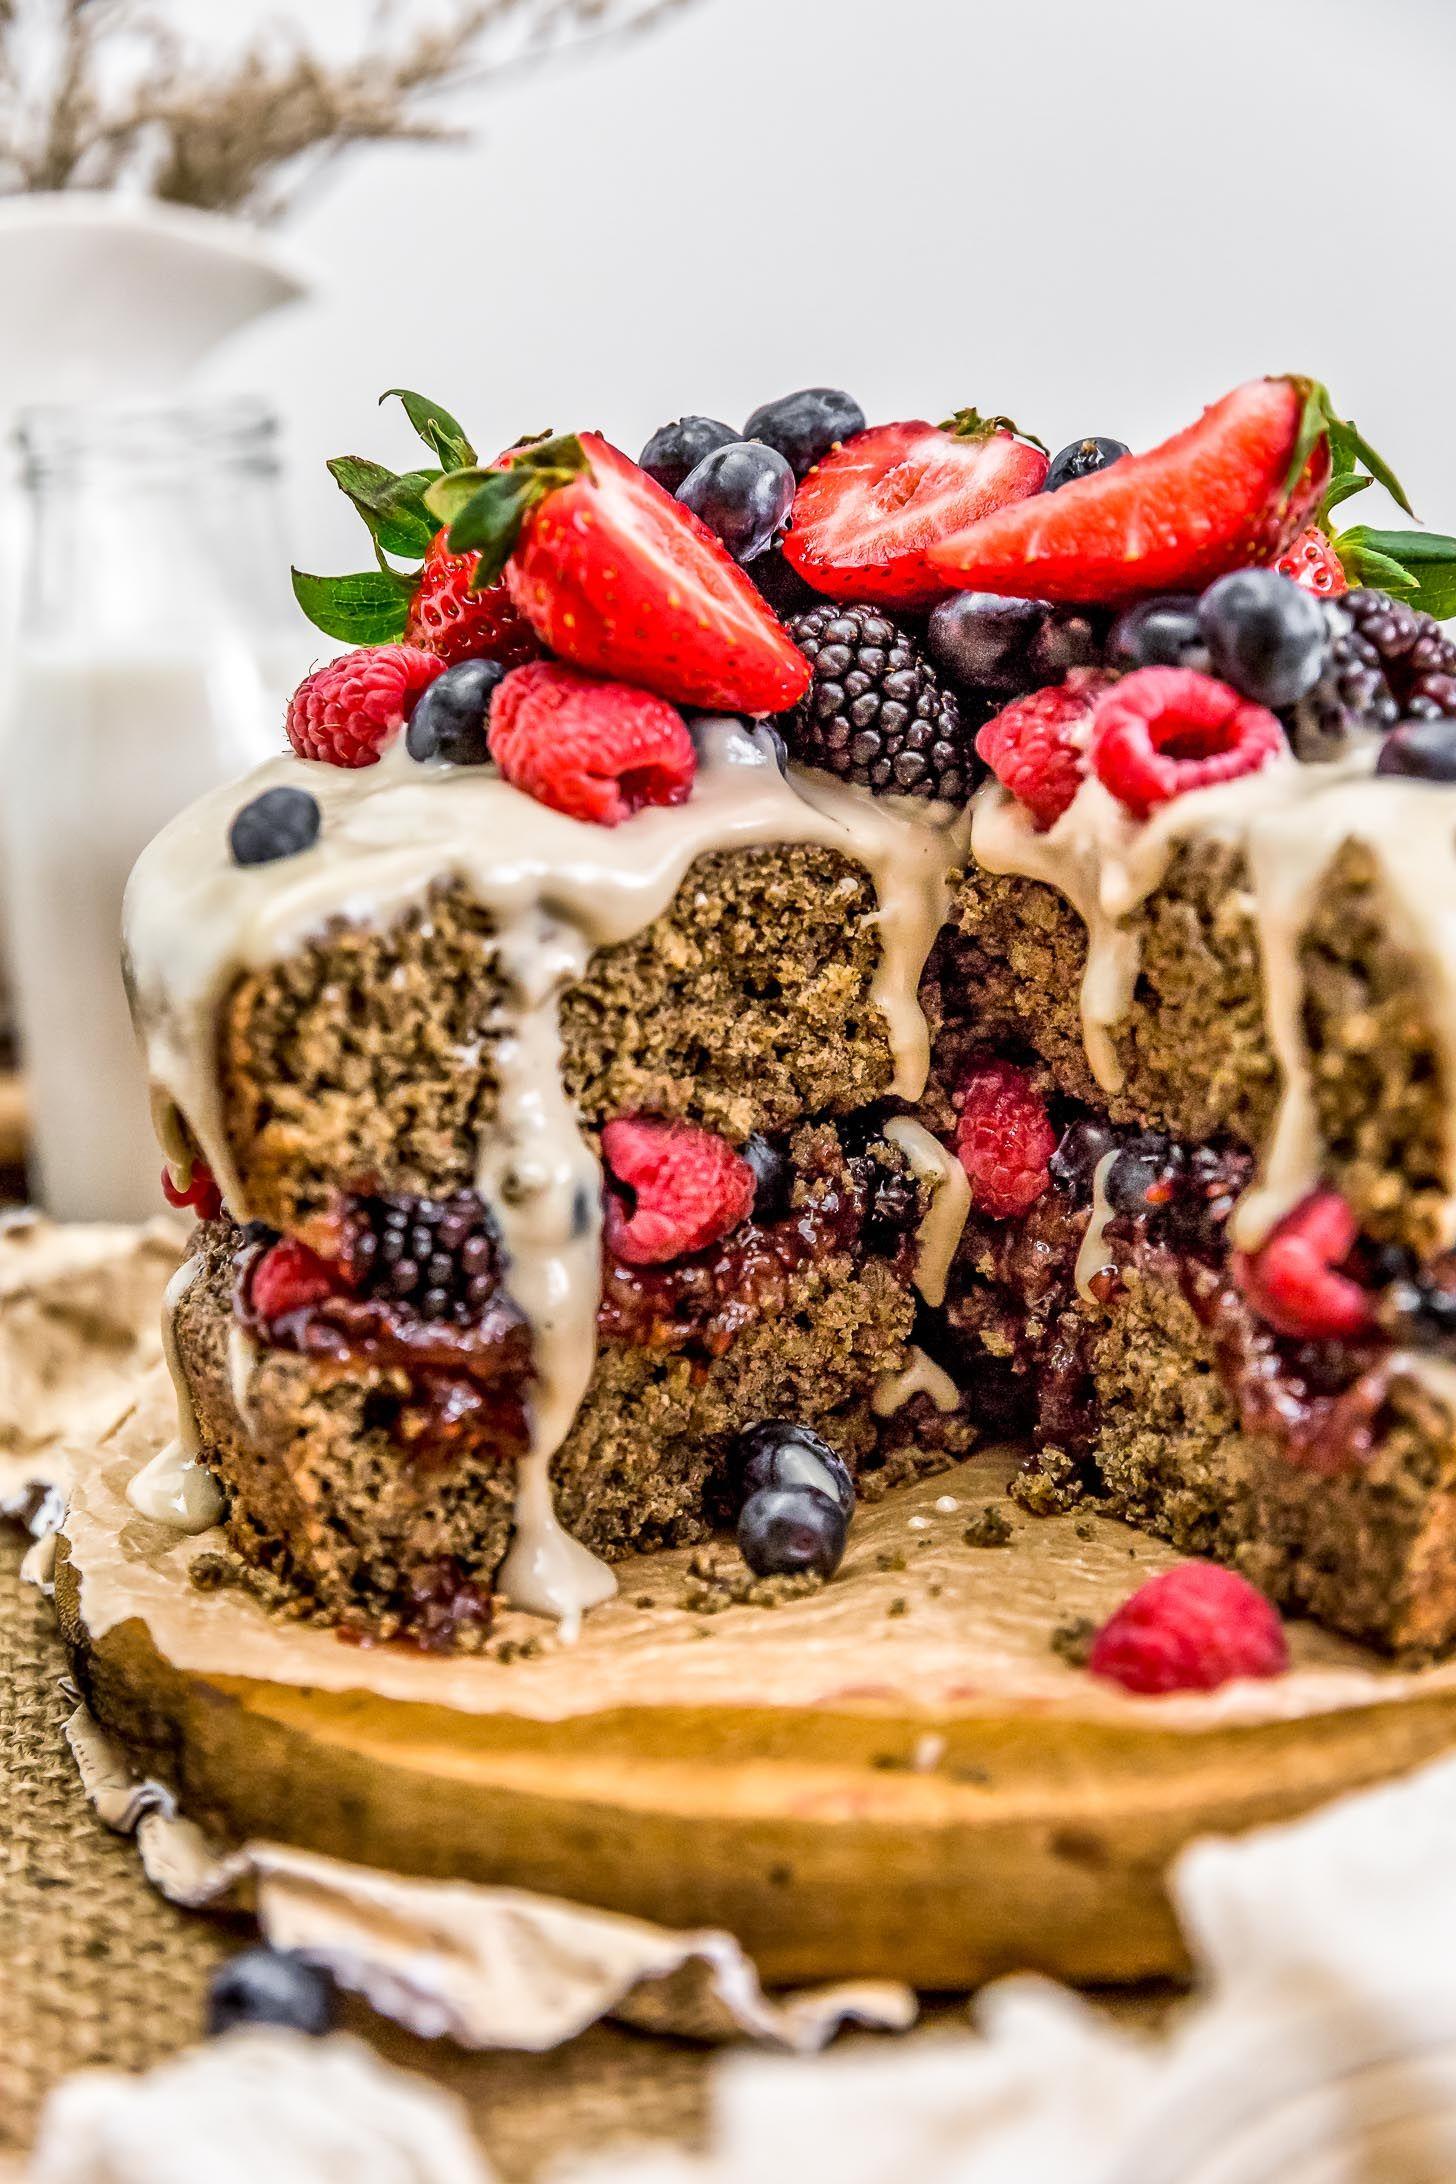 Healthy vegan buckwheat cake recipe with images